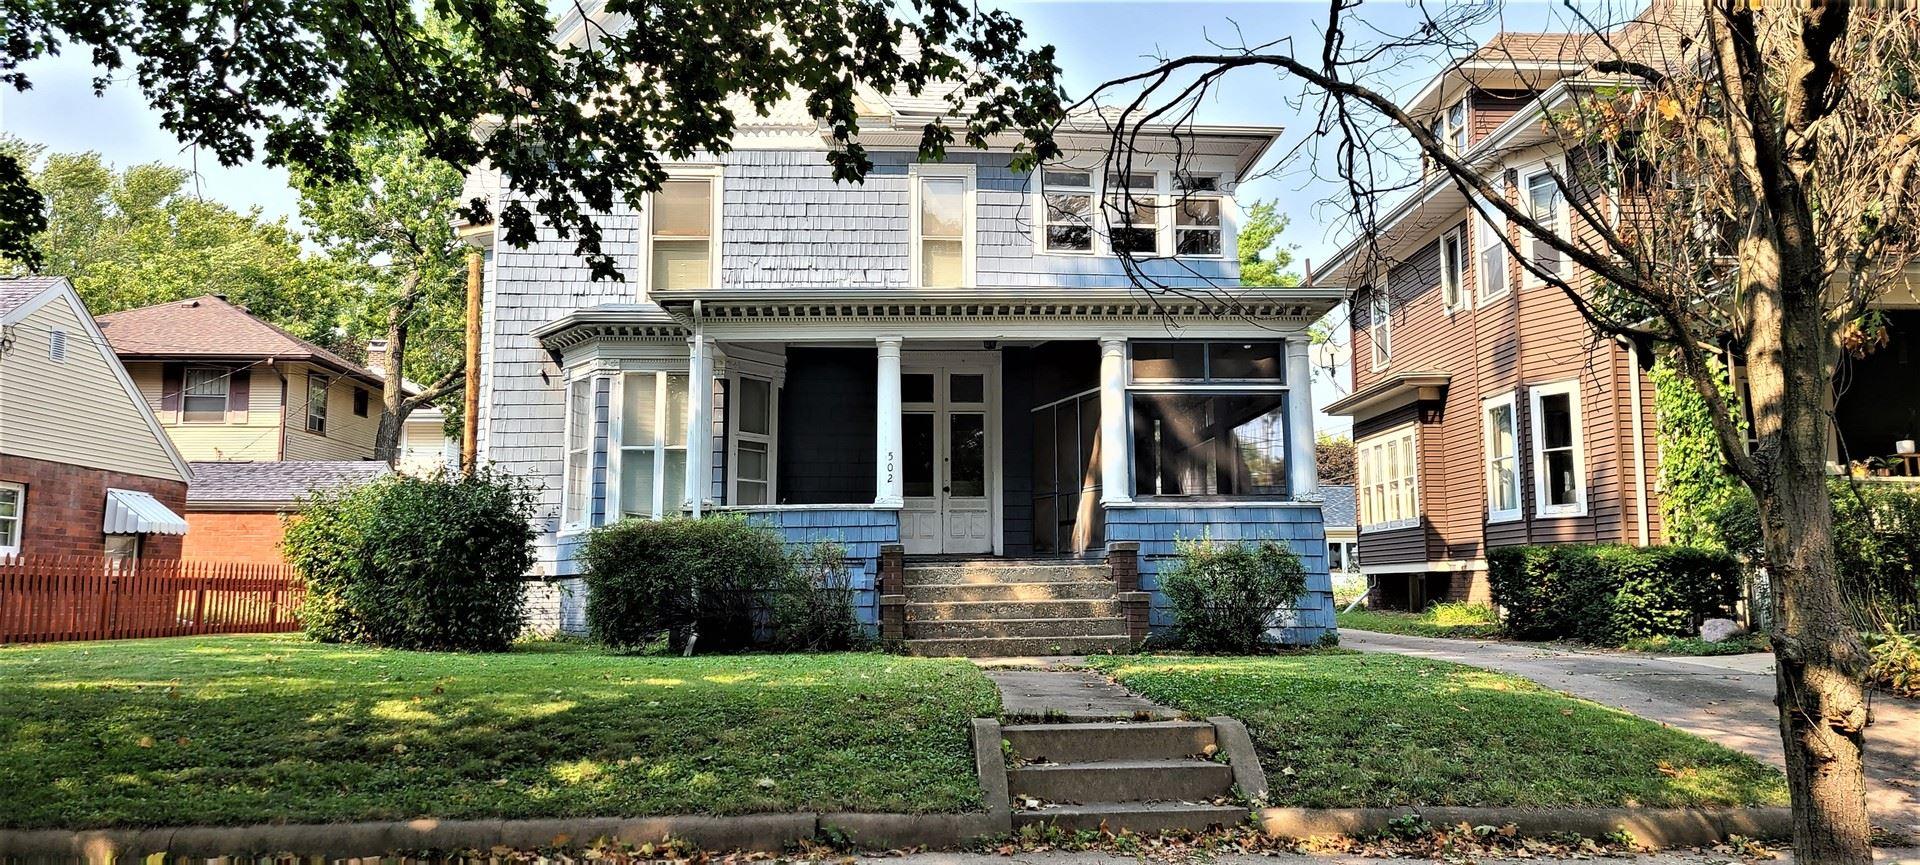 502 E Chestnut Street, Bloomington, IL 61701 - #: 11216905